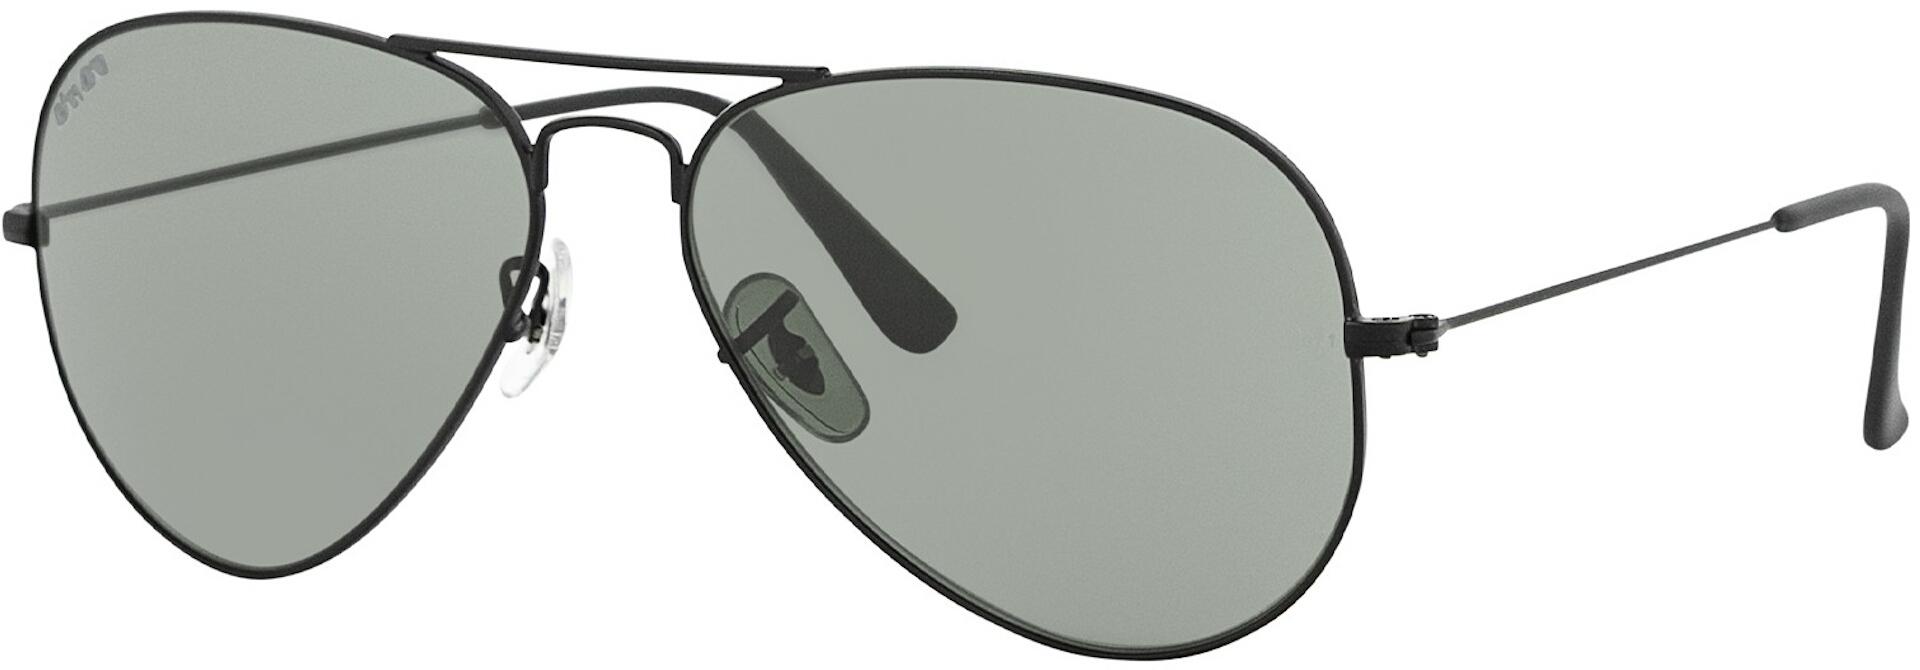 John Doe Aviator Sonnenbrille, schwarz, schwarz